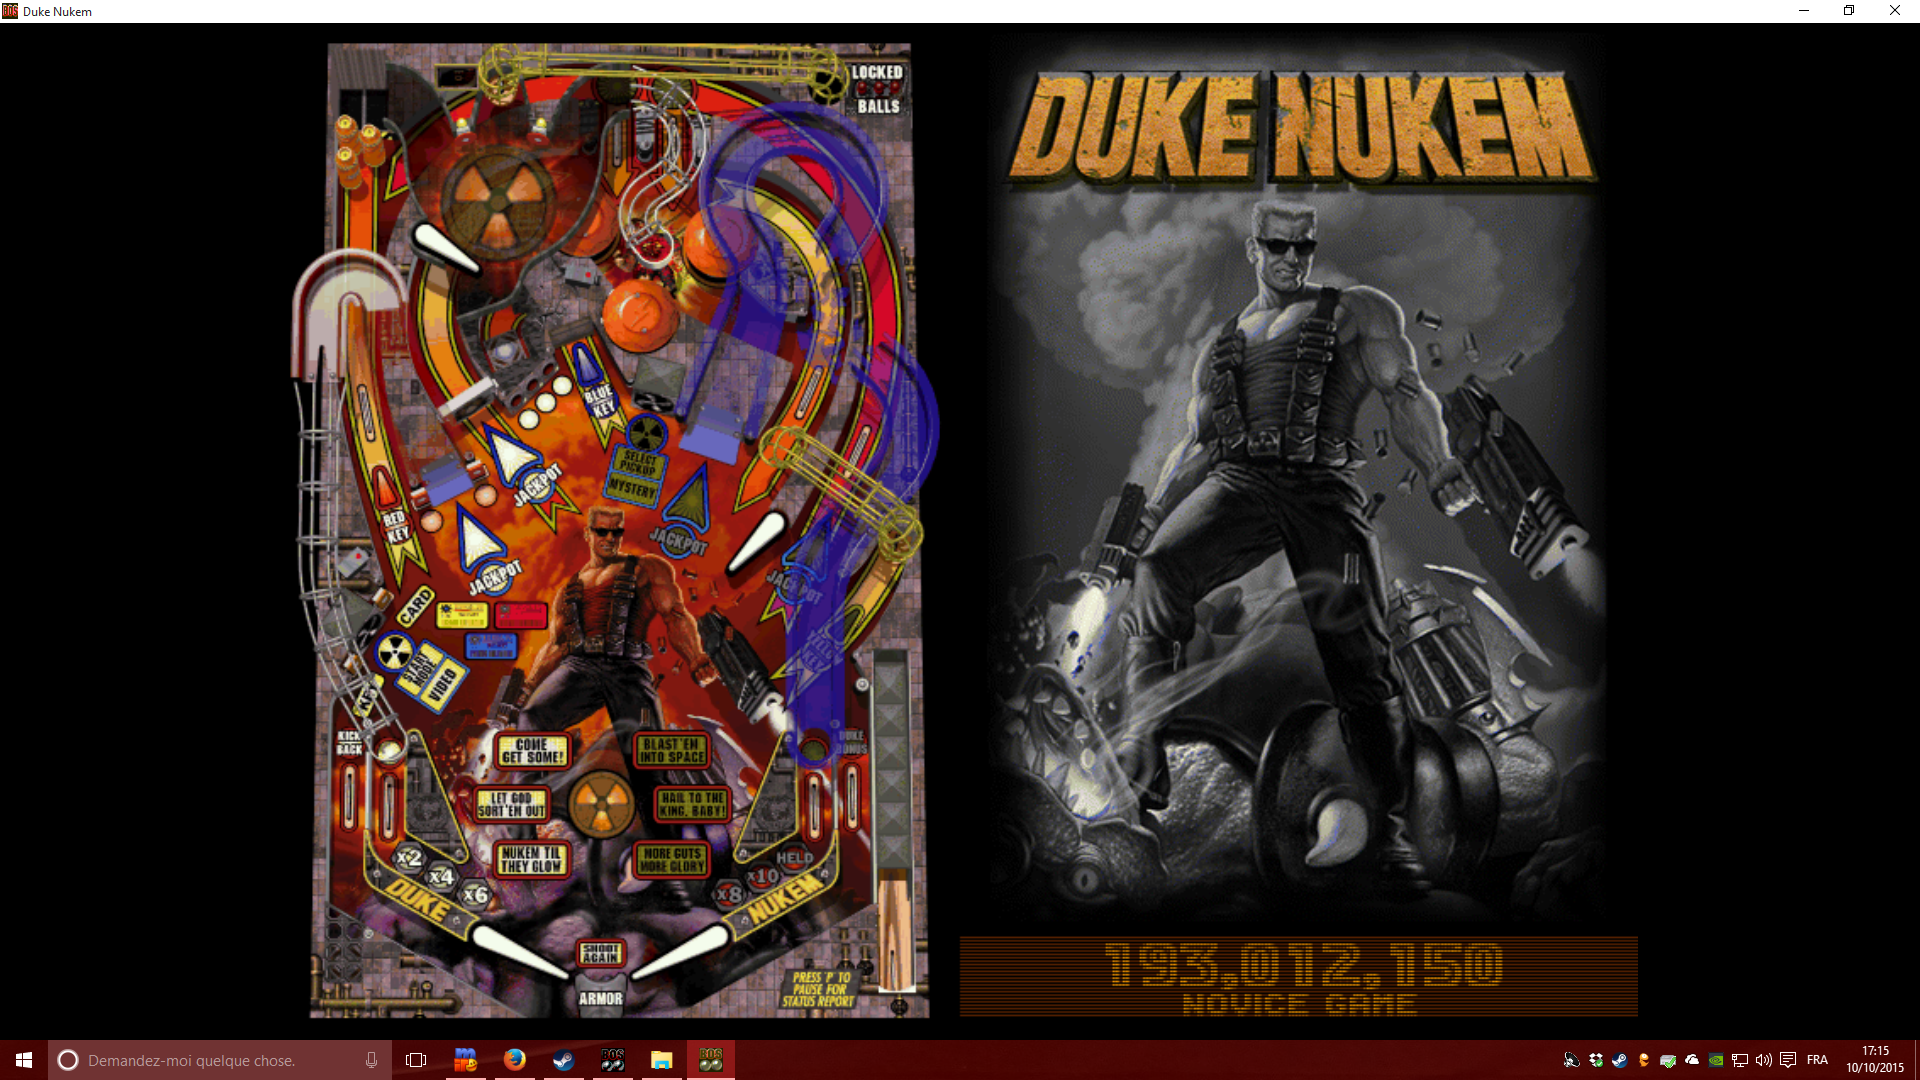 Mantalow: Balls of Steel: Duke Nukem [Novice] (PC) 193,012,150 points on 2015-10-10 11:23:01